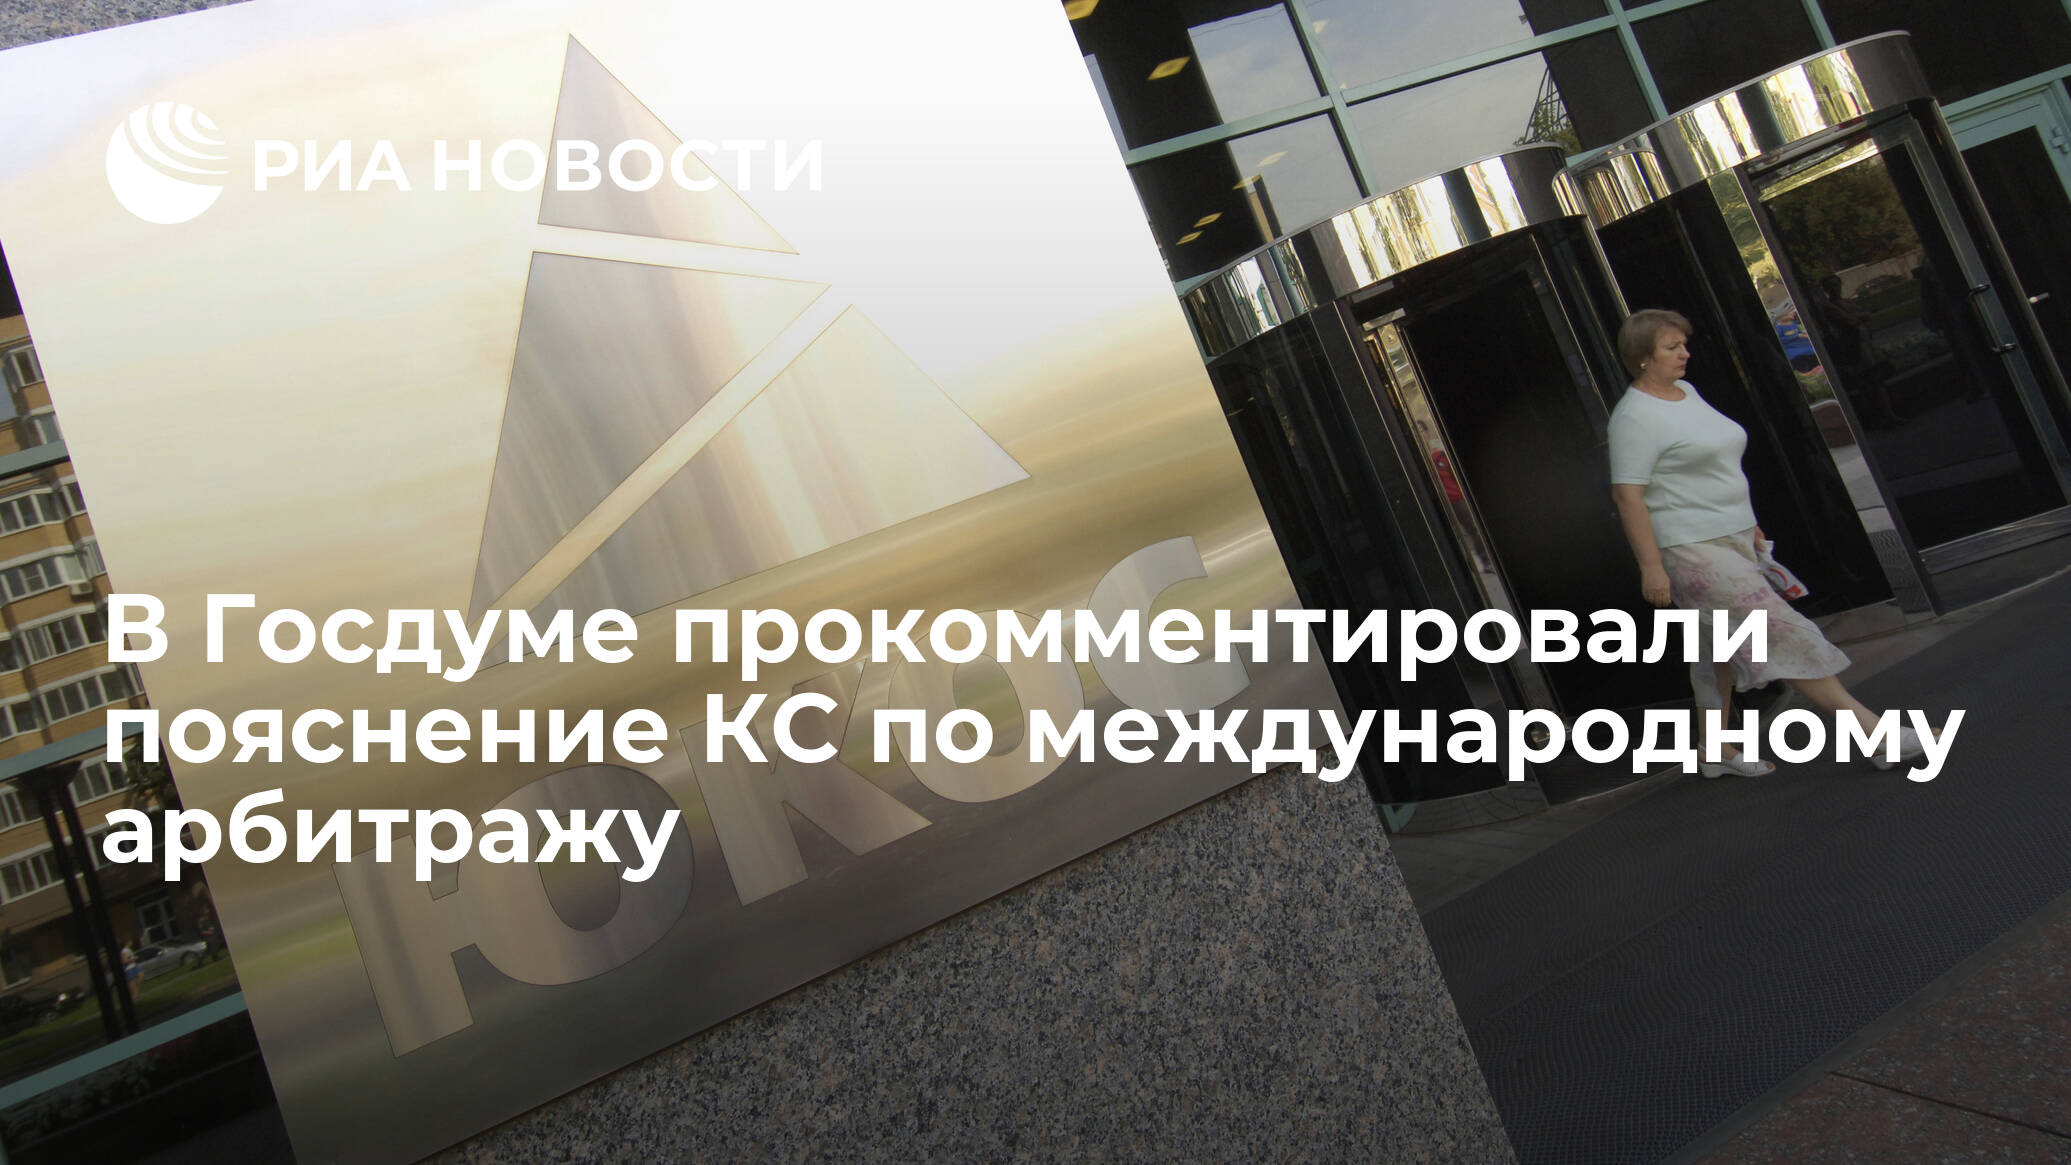 В Госдуме прокомментировали объяснение КС по международному арбитражу